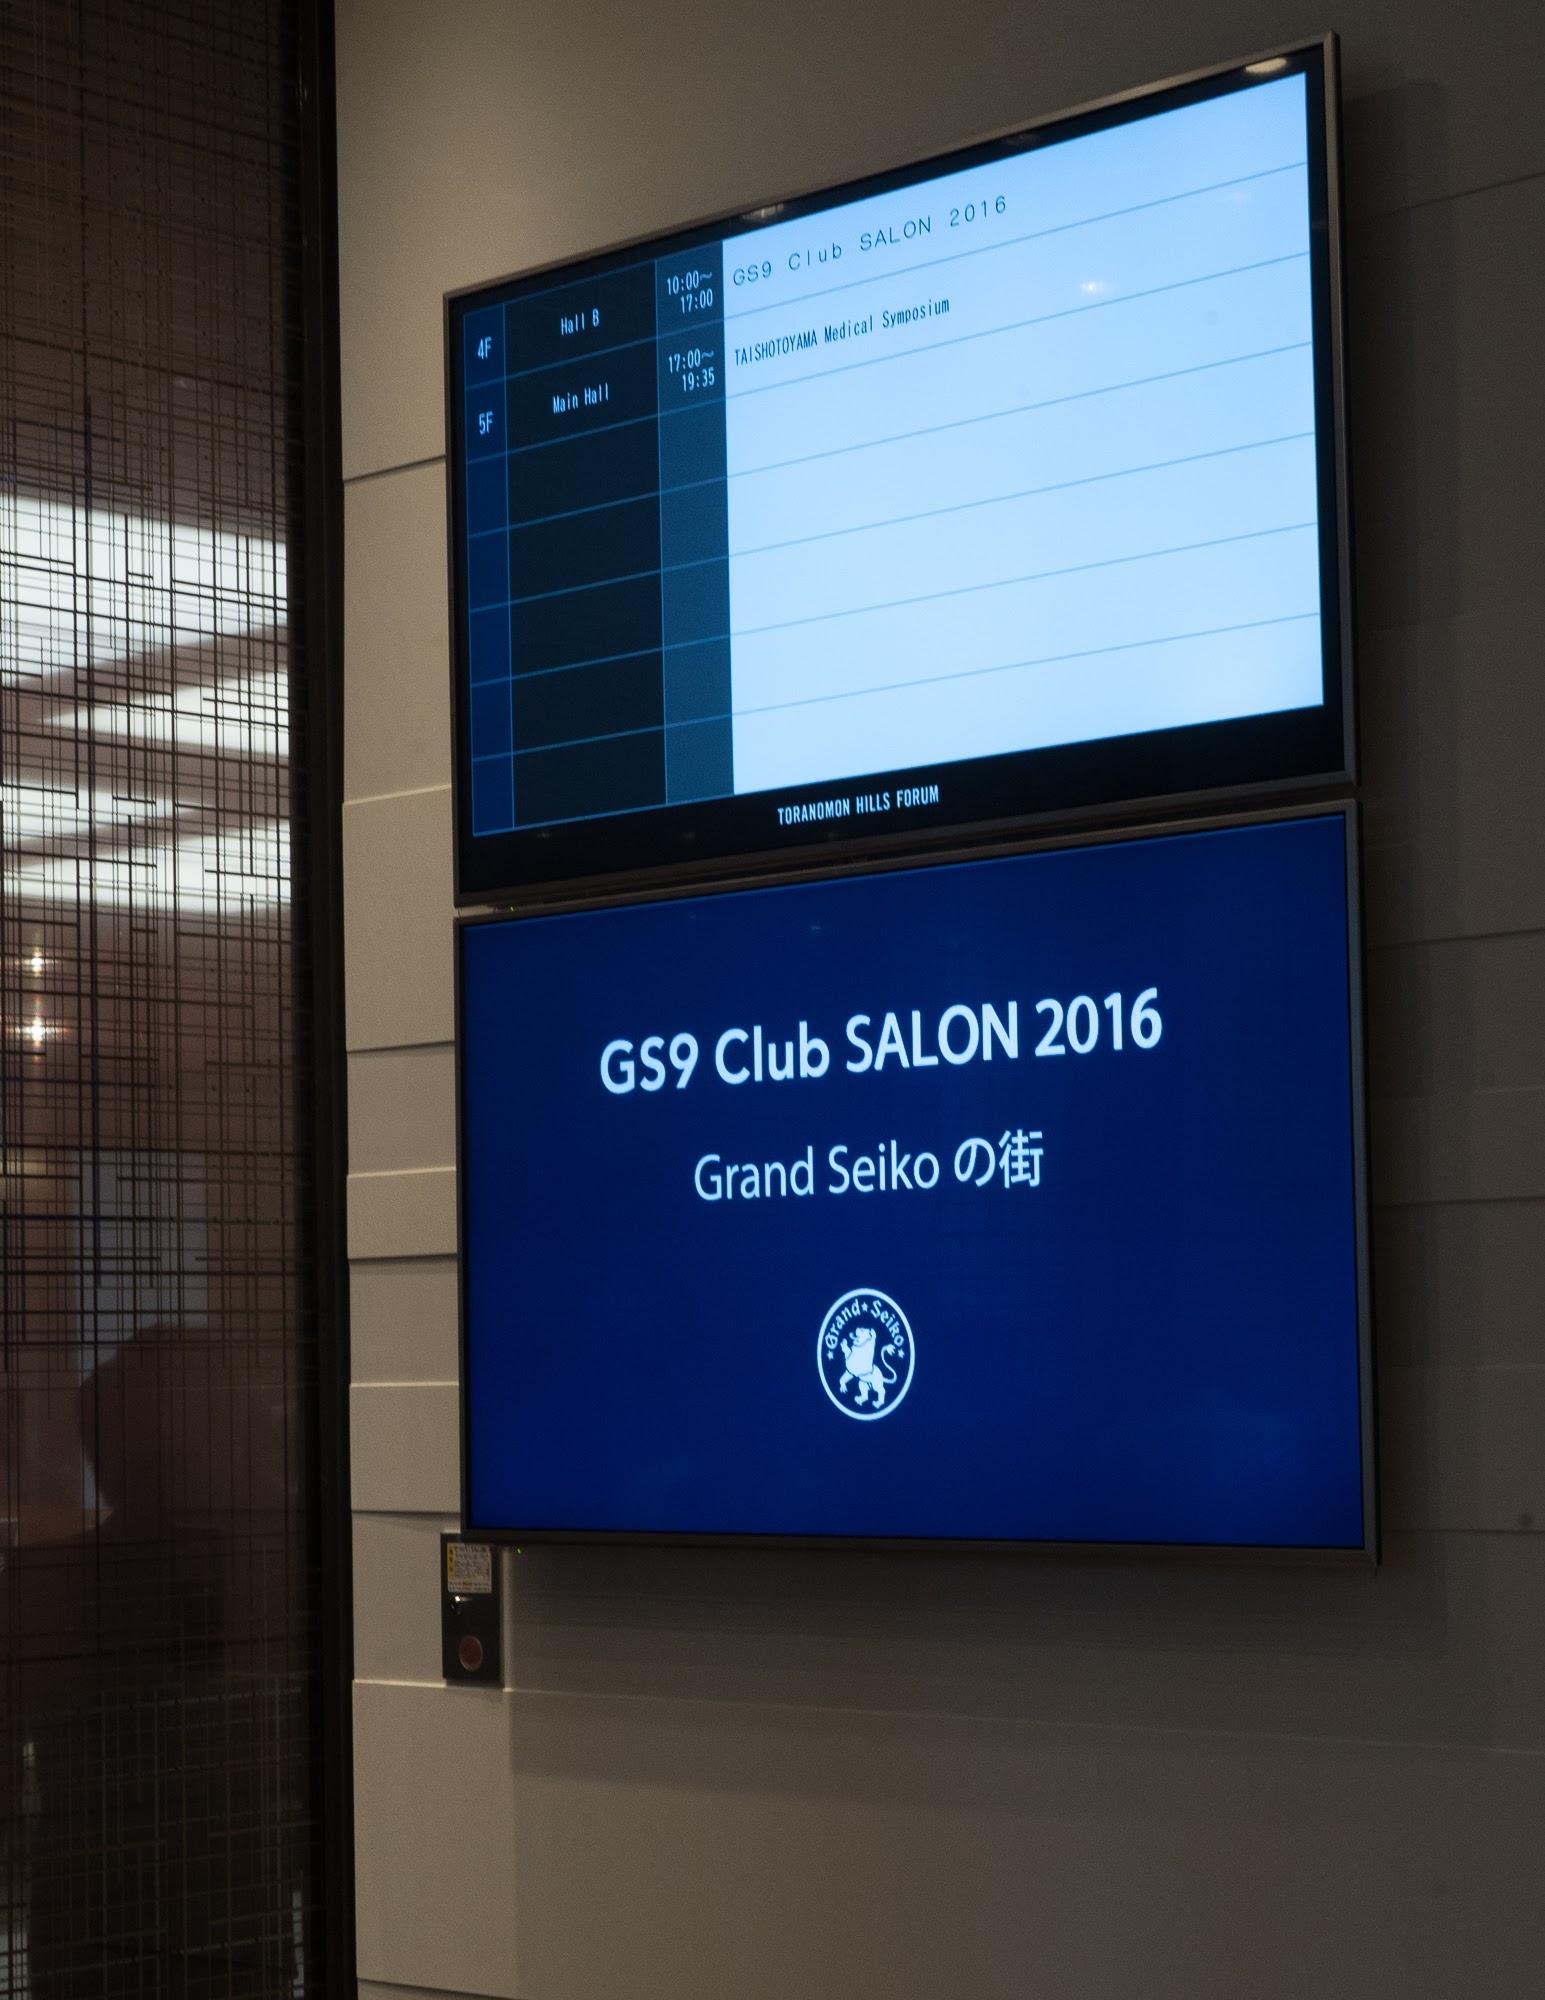 GS9 Club Salon 2016